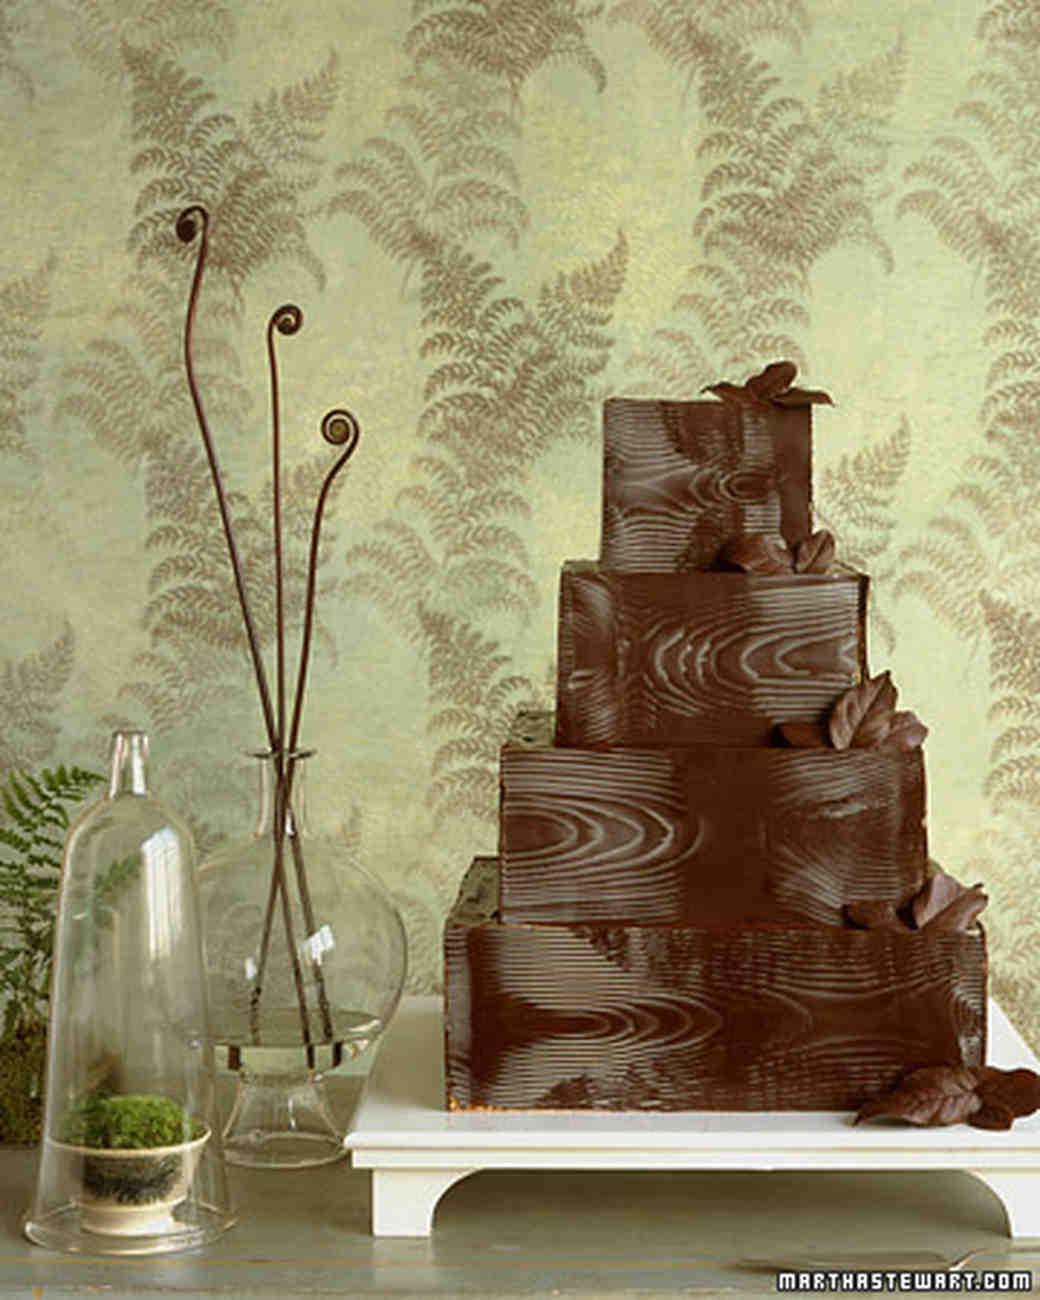 Martha Stewart Weddings: Making Chocolate Woodgrain Recipe